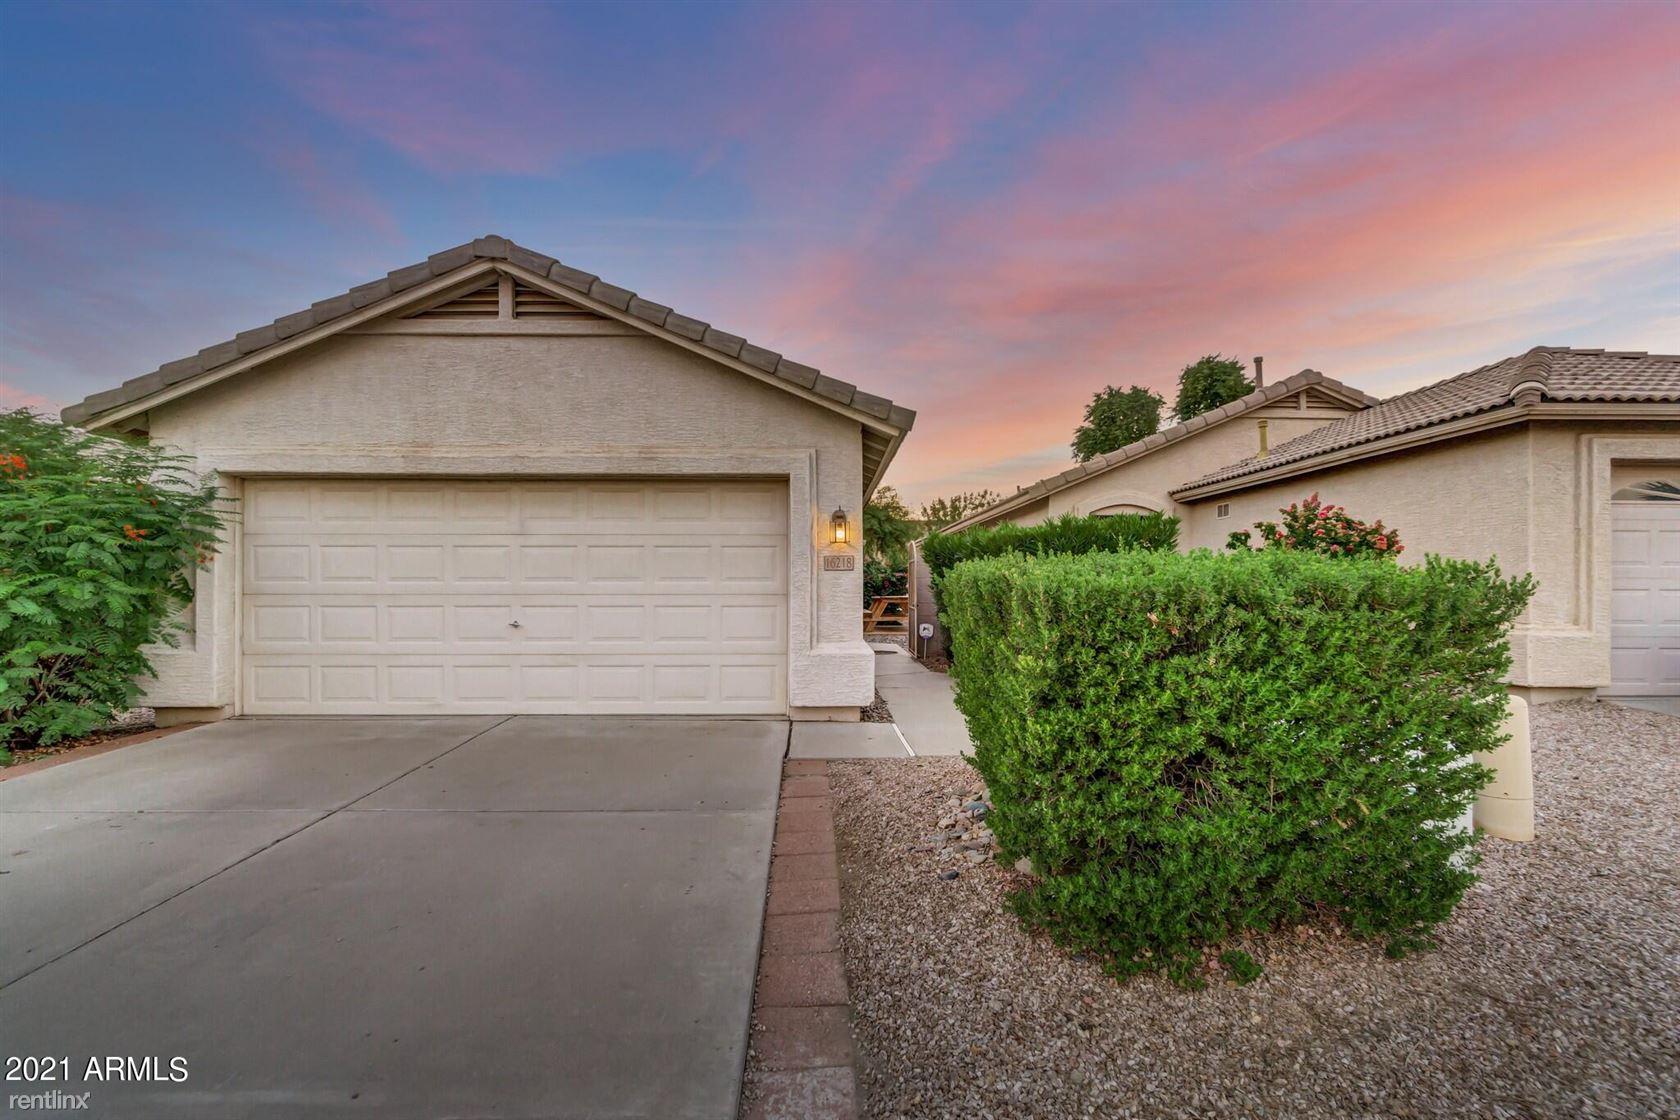 16218 47th Street, Phoenix, AZ - 2,250 USD/ month